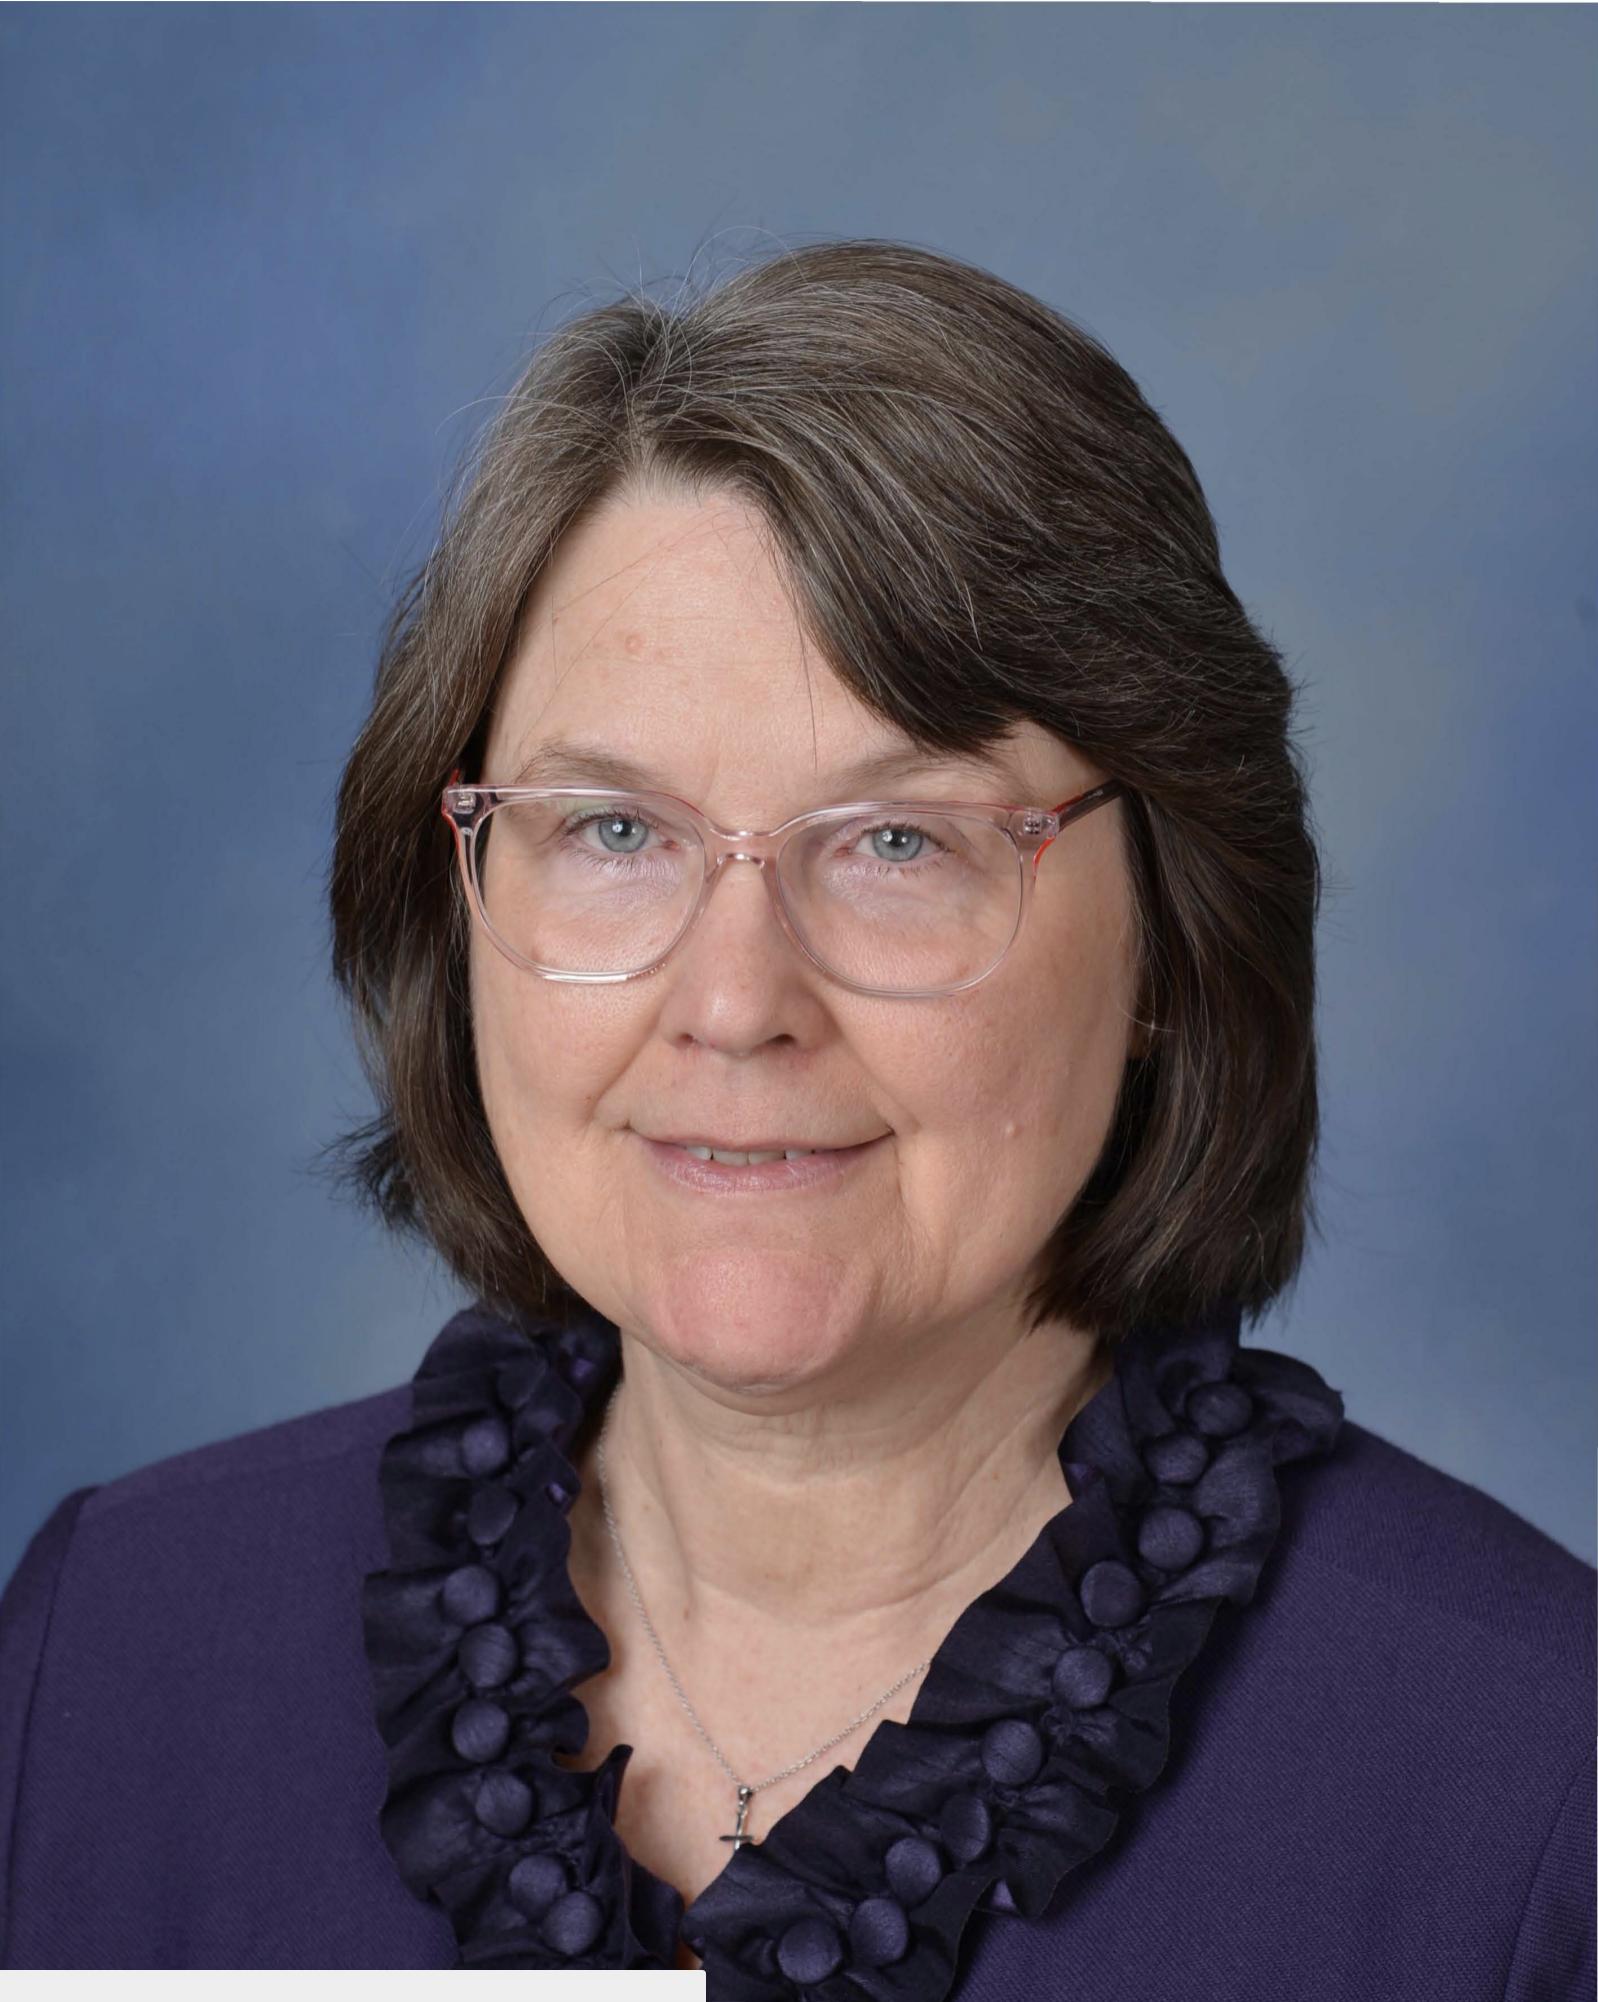 Dr. Christy Anne Vaughan